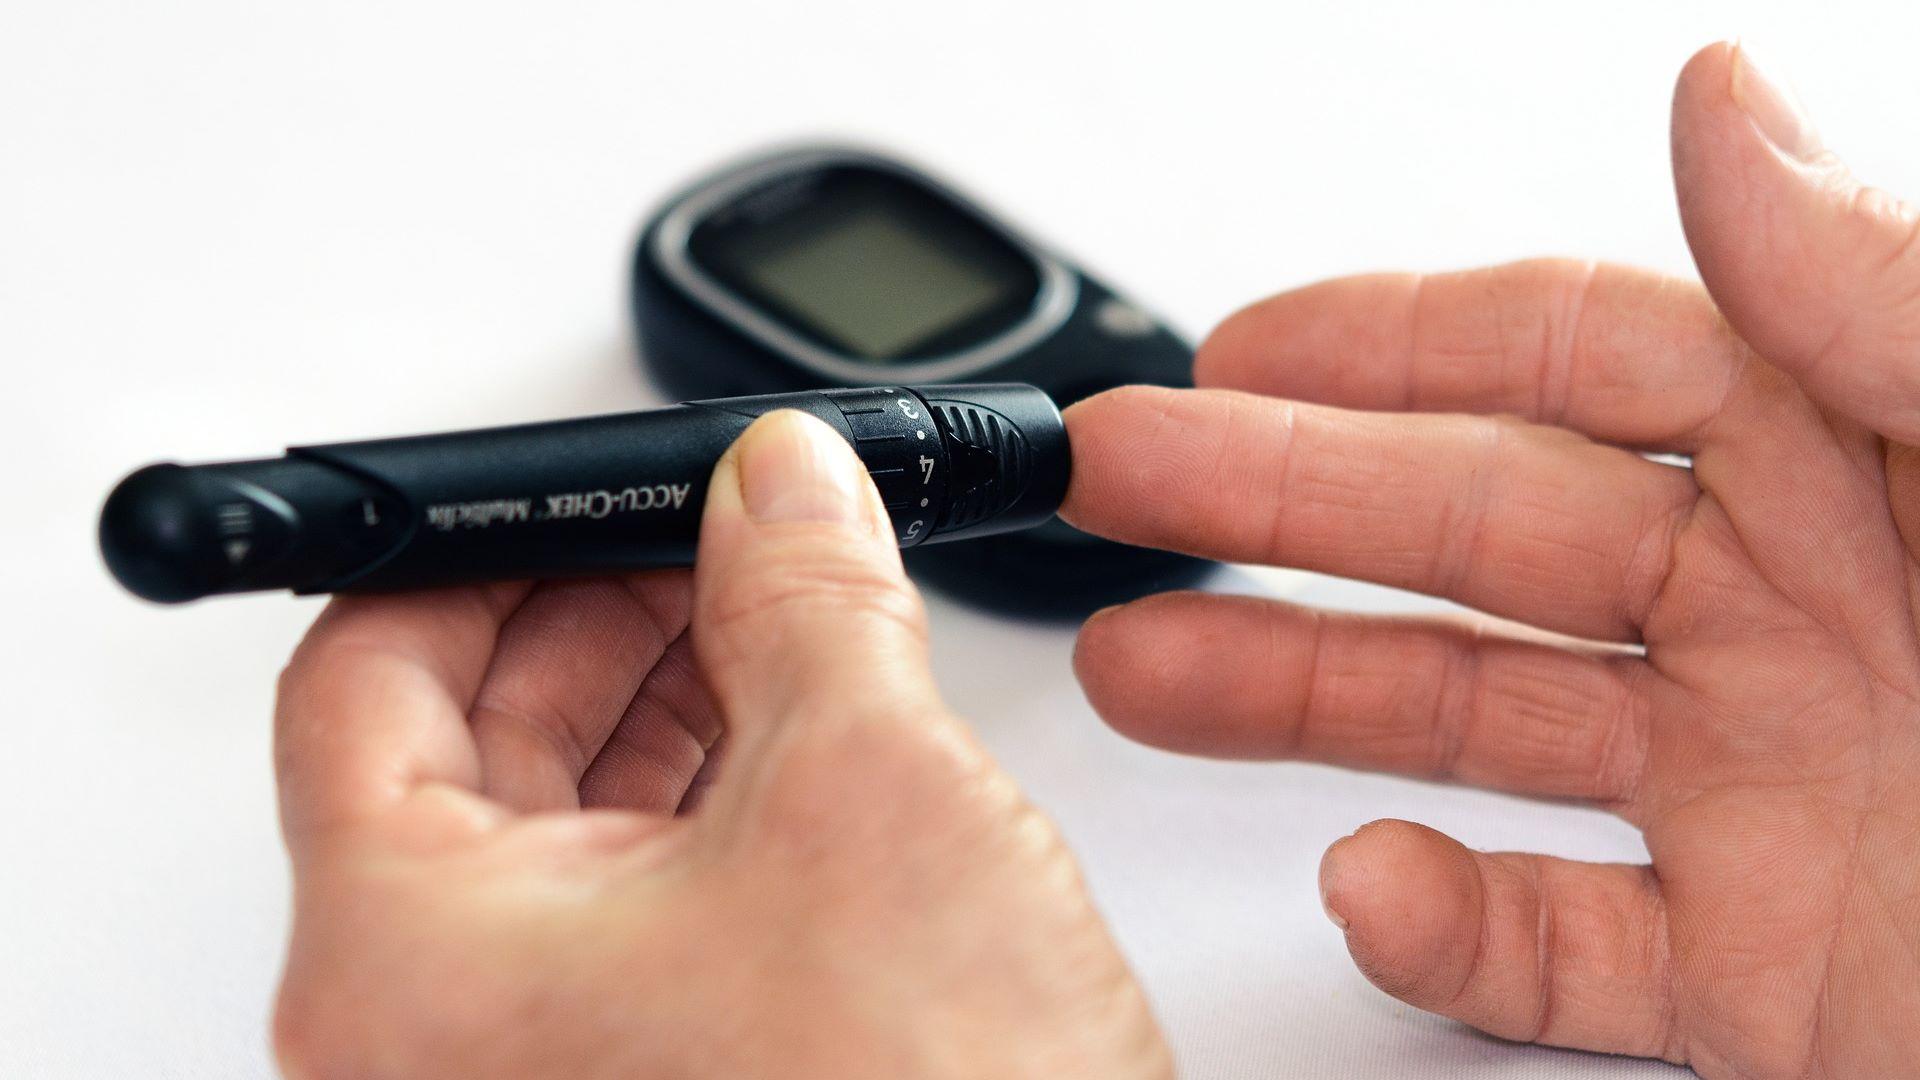 Corona-Risikogruppe Diabetiker: Welches Verhalten ist jetzt richtig?